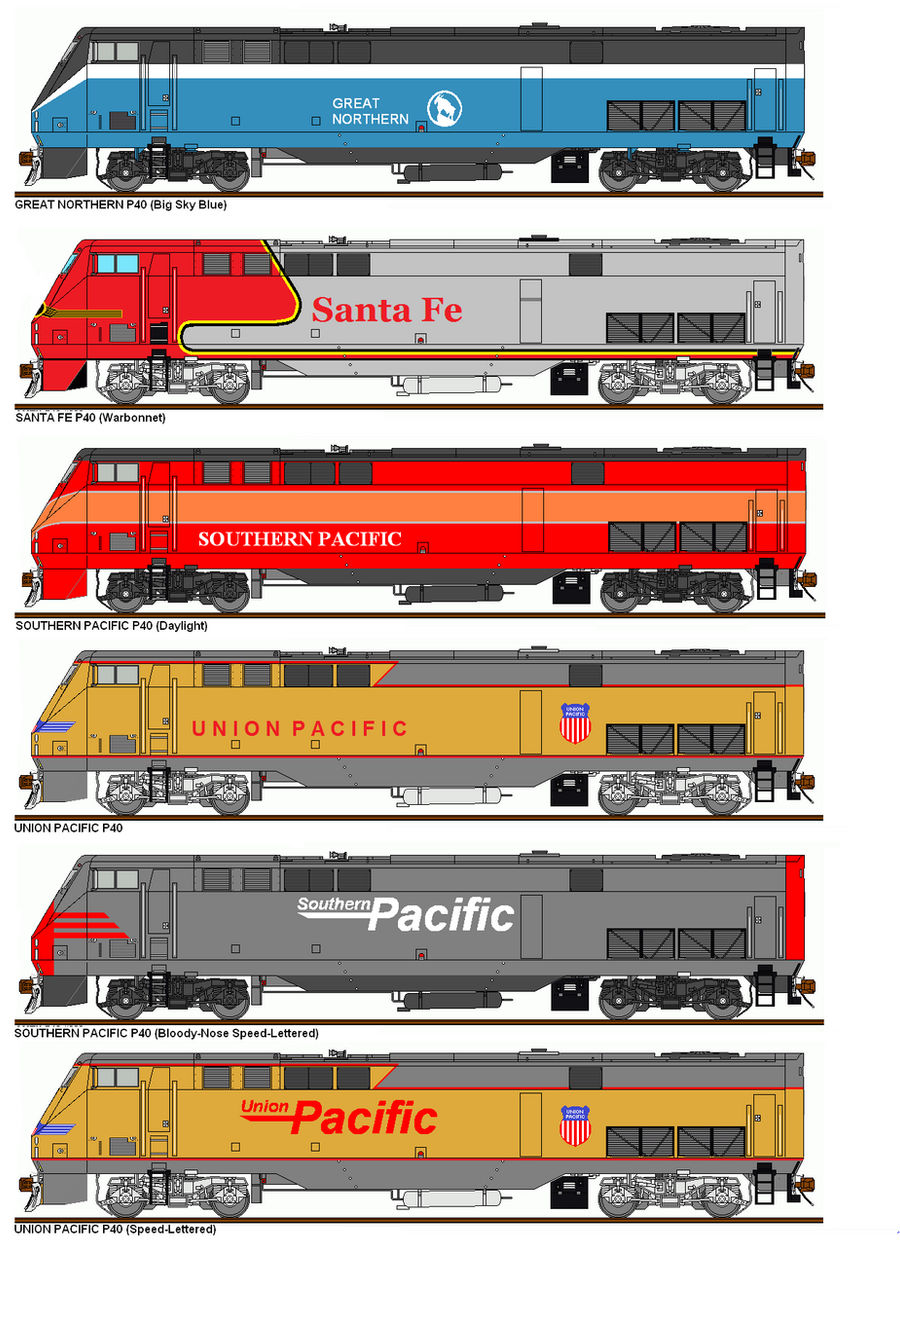 Freelance Railroad P40 Paint Schemes by Pb1kenobi on DeviantArt